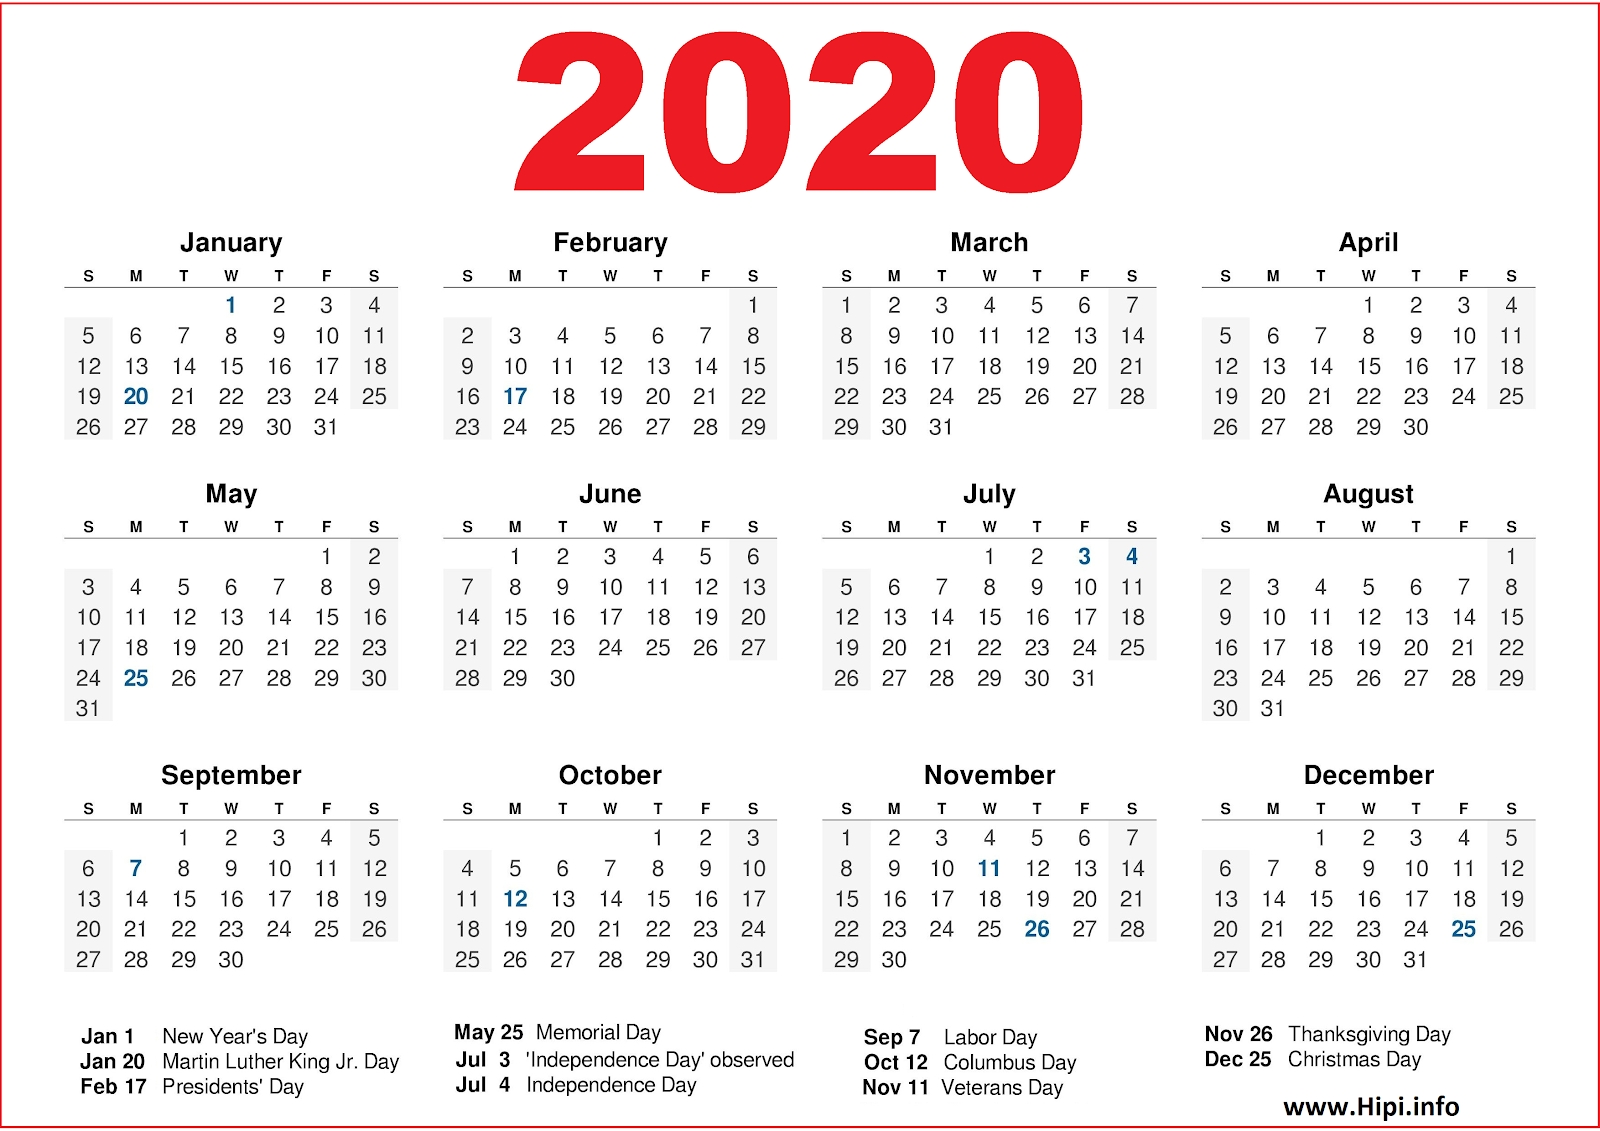 2020 Calendar Printable With Us Holidays - 2020 Calendar